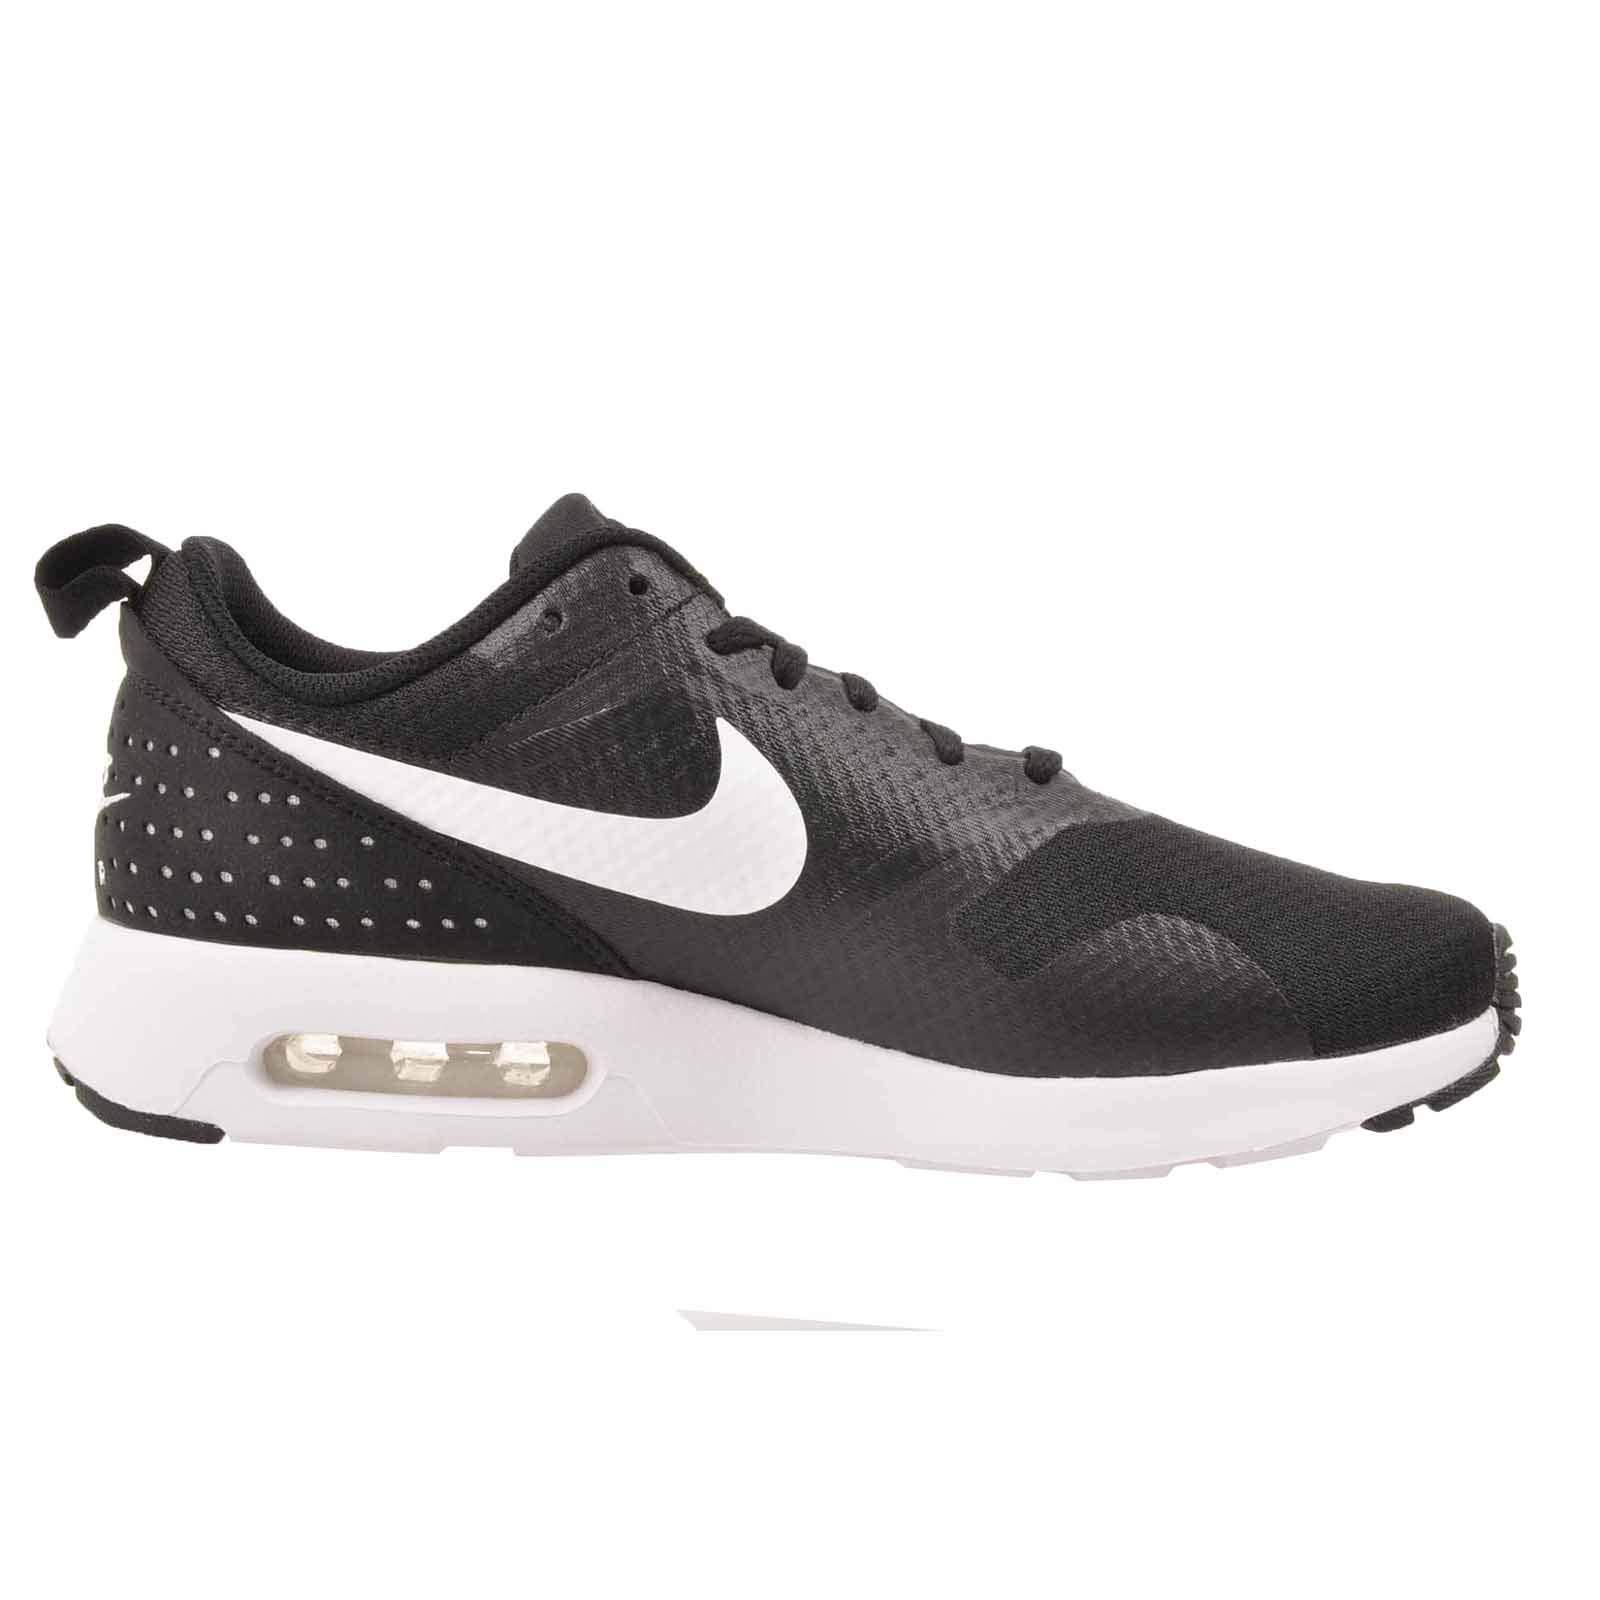 promo code 0bc21 d8628 Galleon - NIKE Women s Air Max Tavas Running Shoes Black White 916791 001  (9 B(M) US)